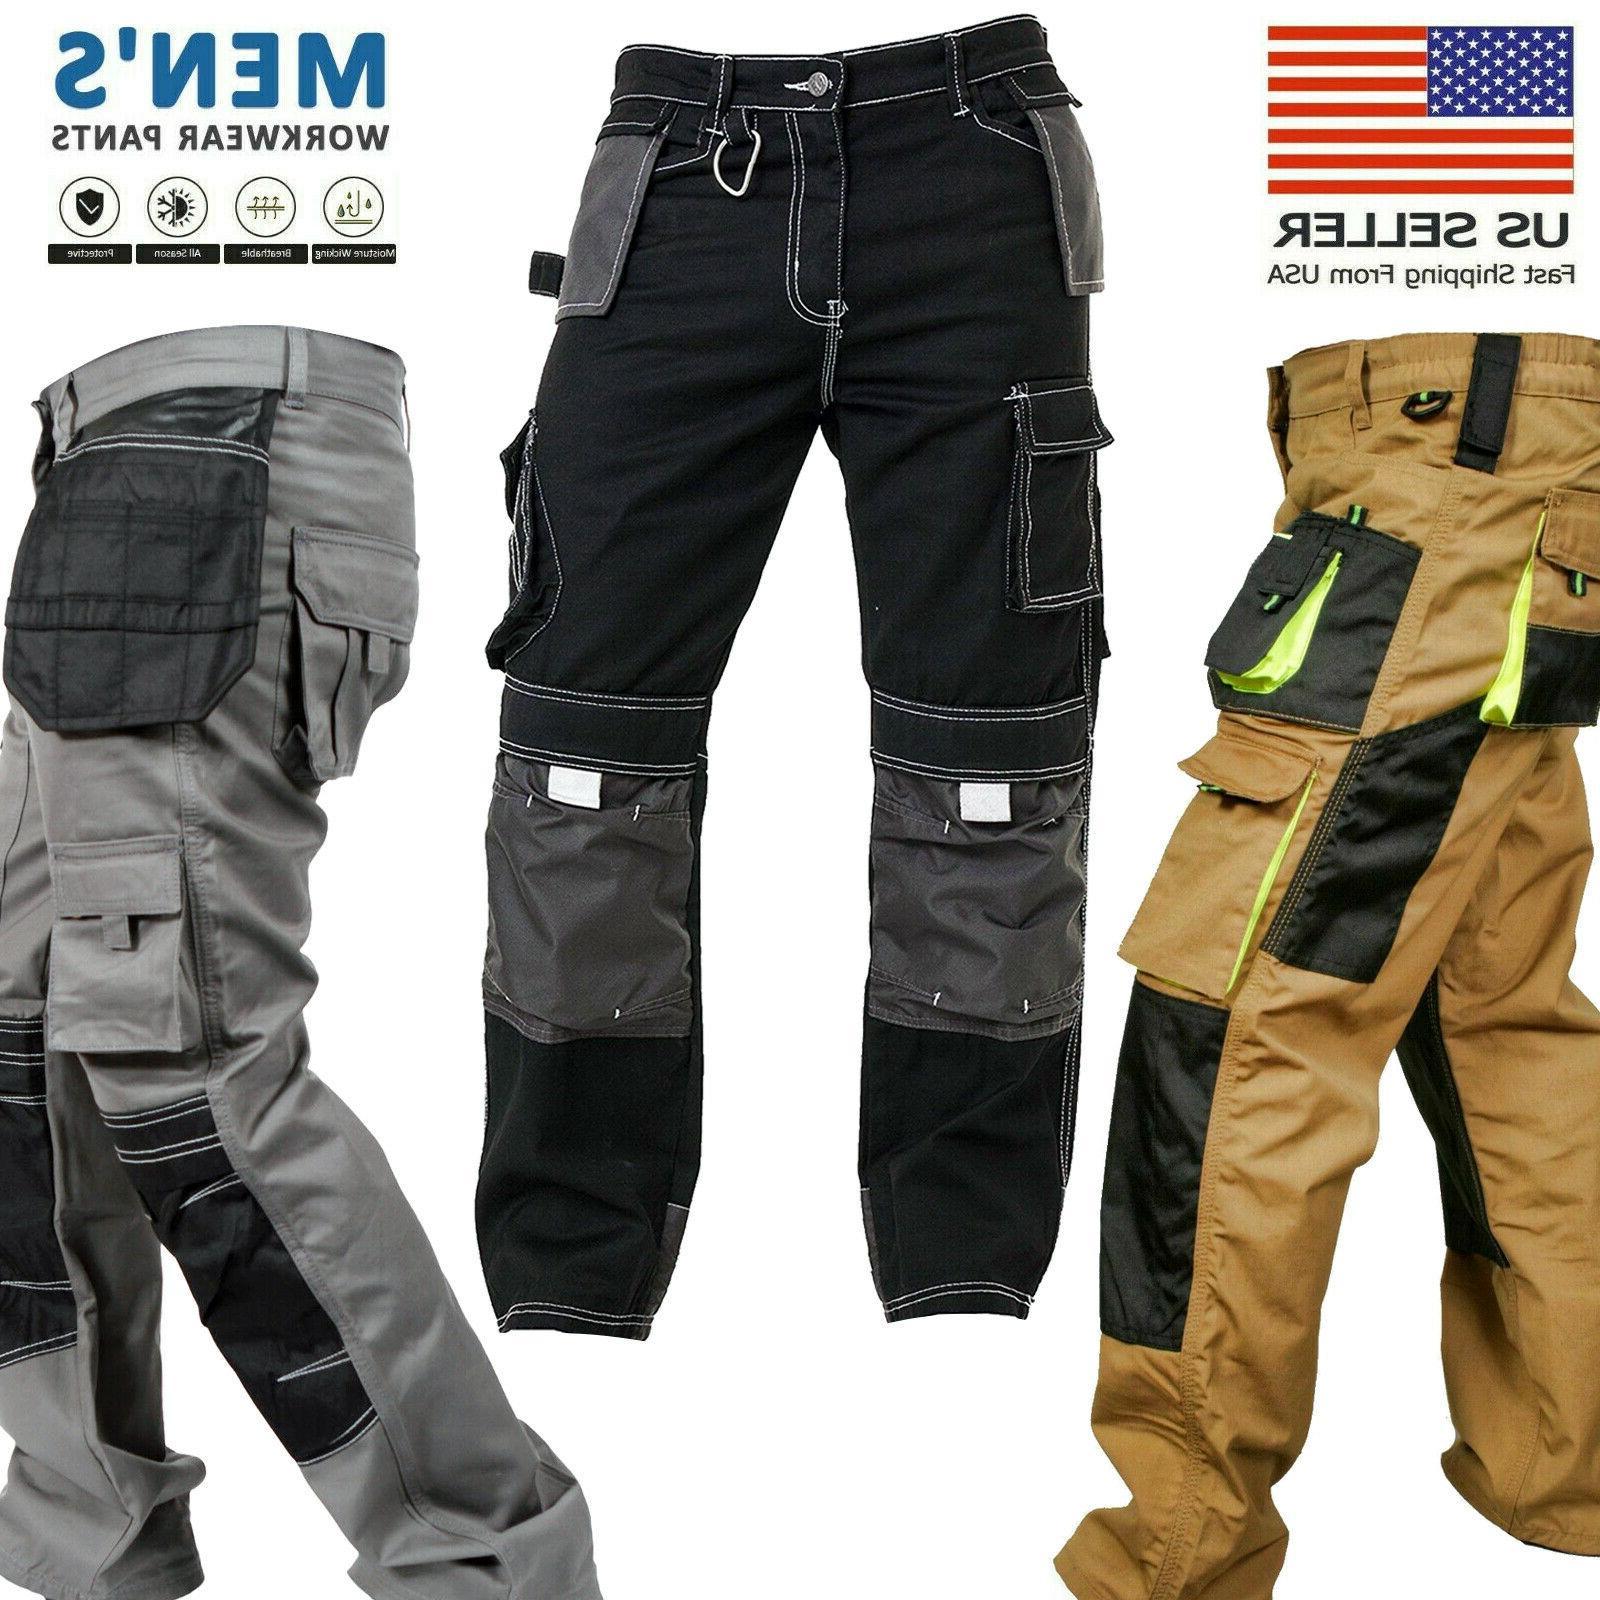 mens work worker safety cordura trousers kneepad